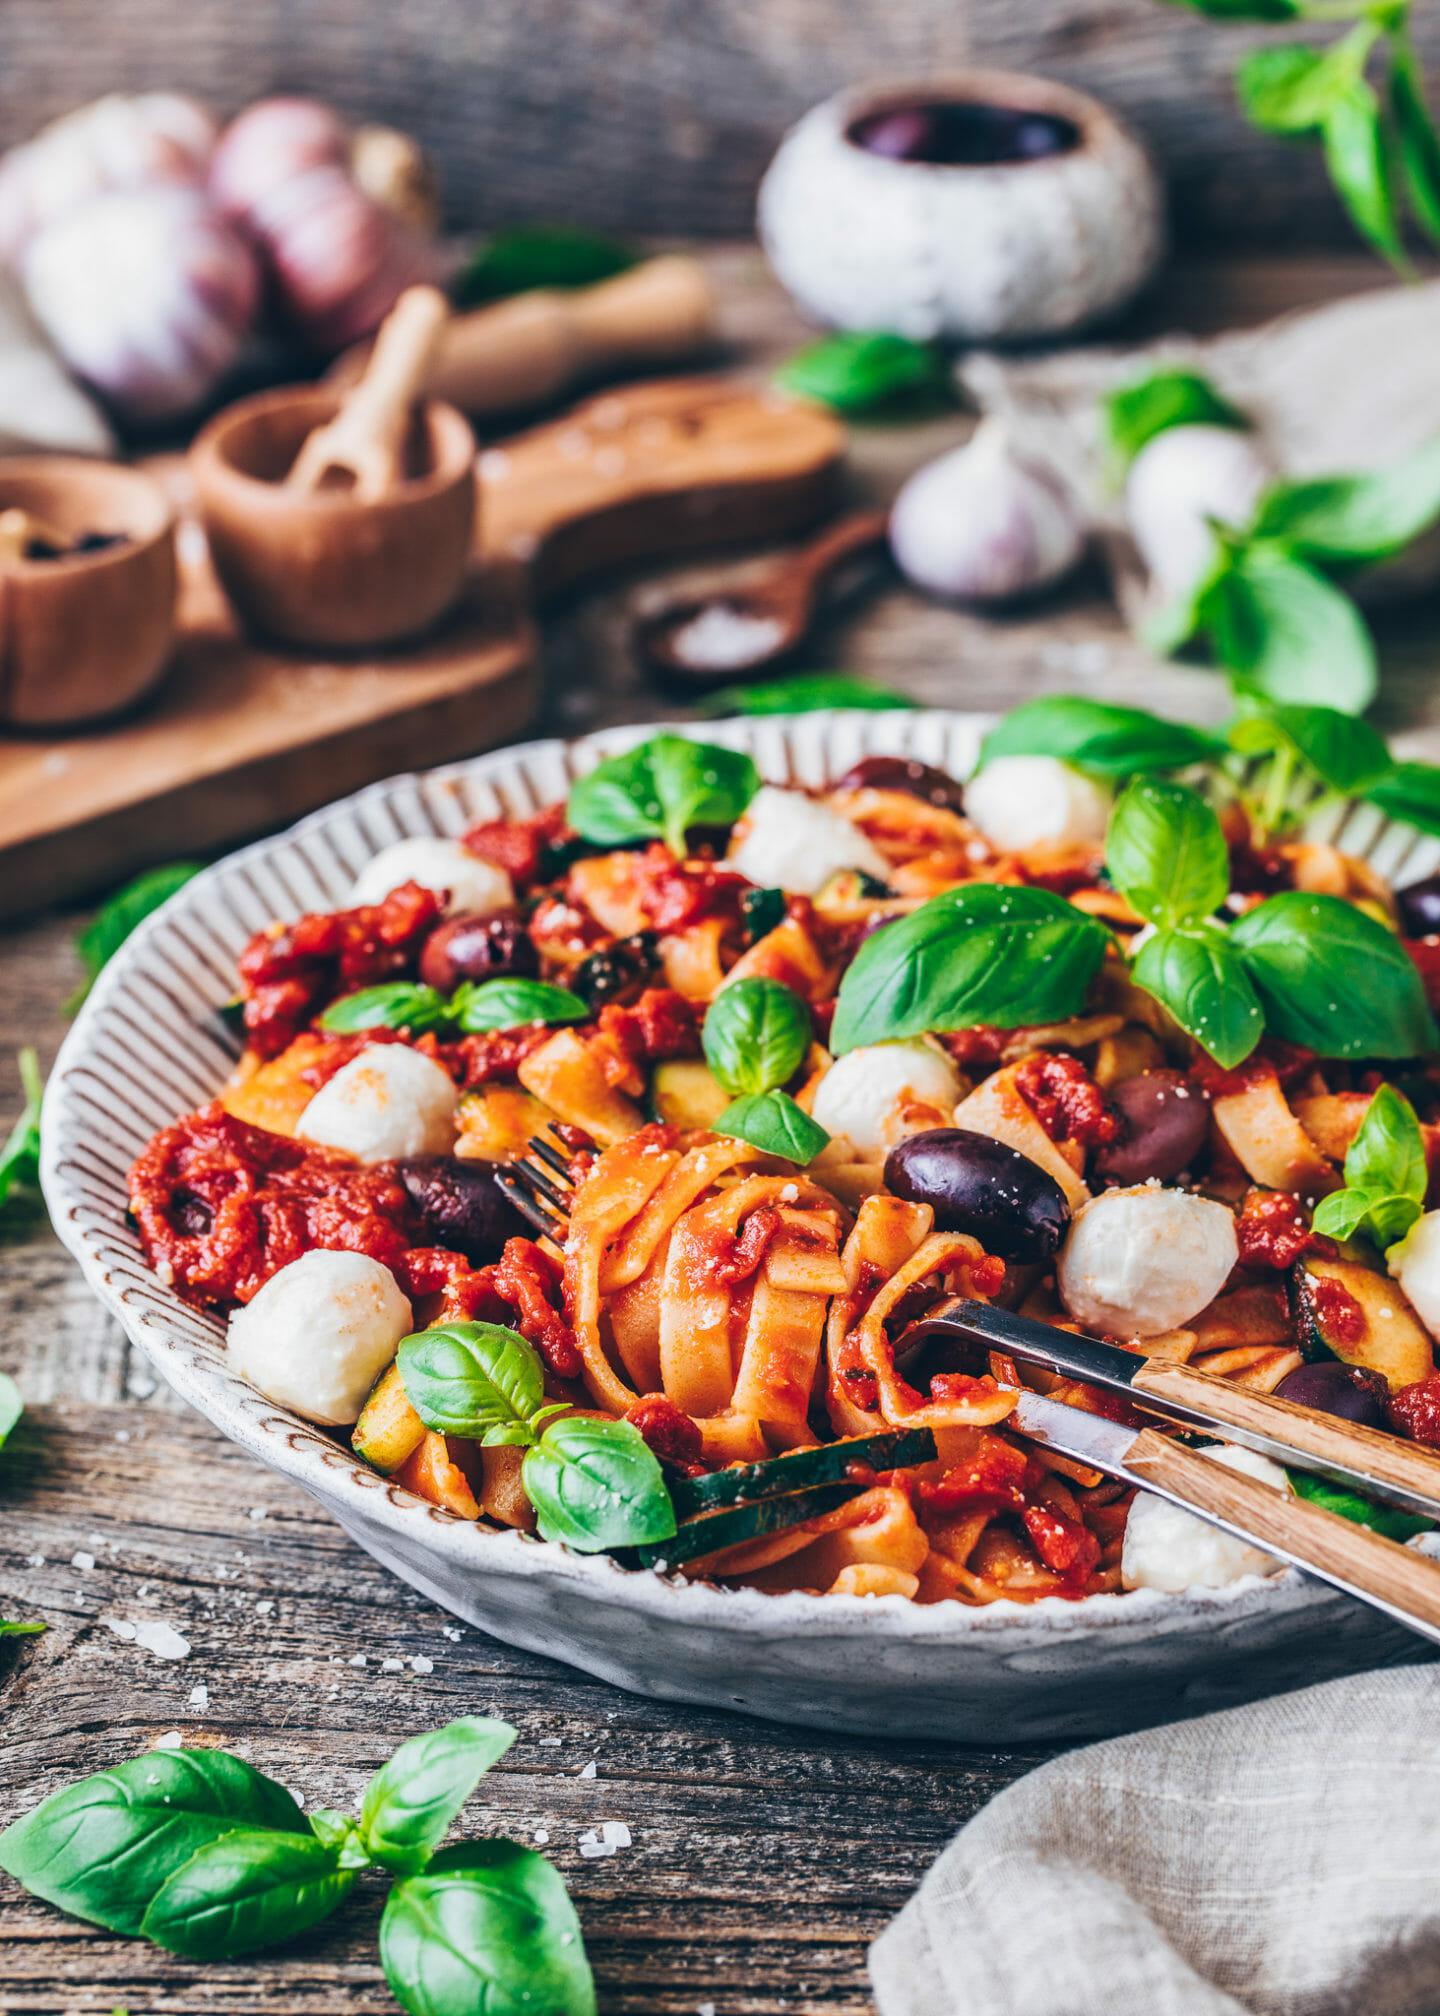 Tomato Pasta with Mozzarella, Parmesan, Olives, and Basil